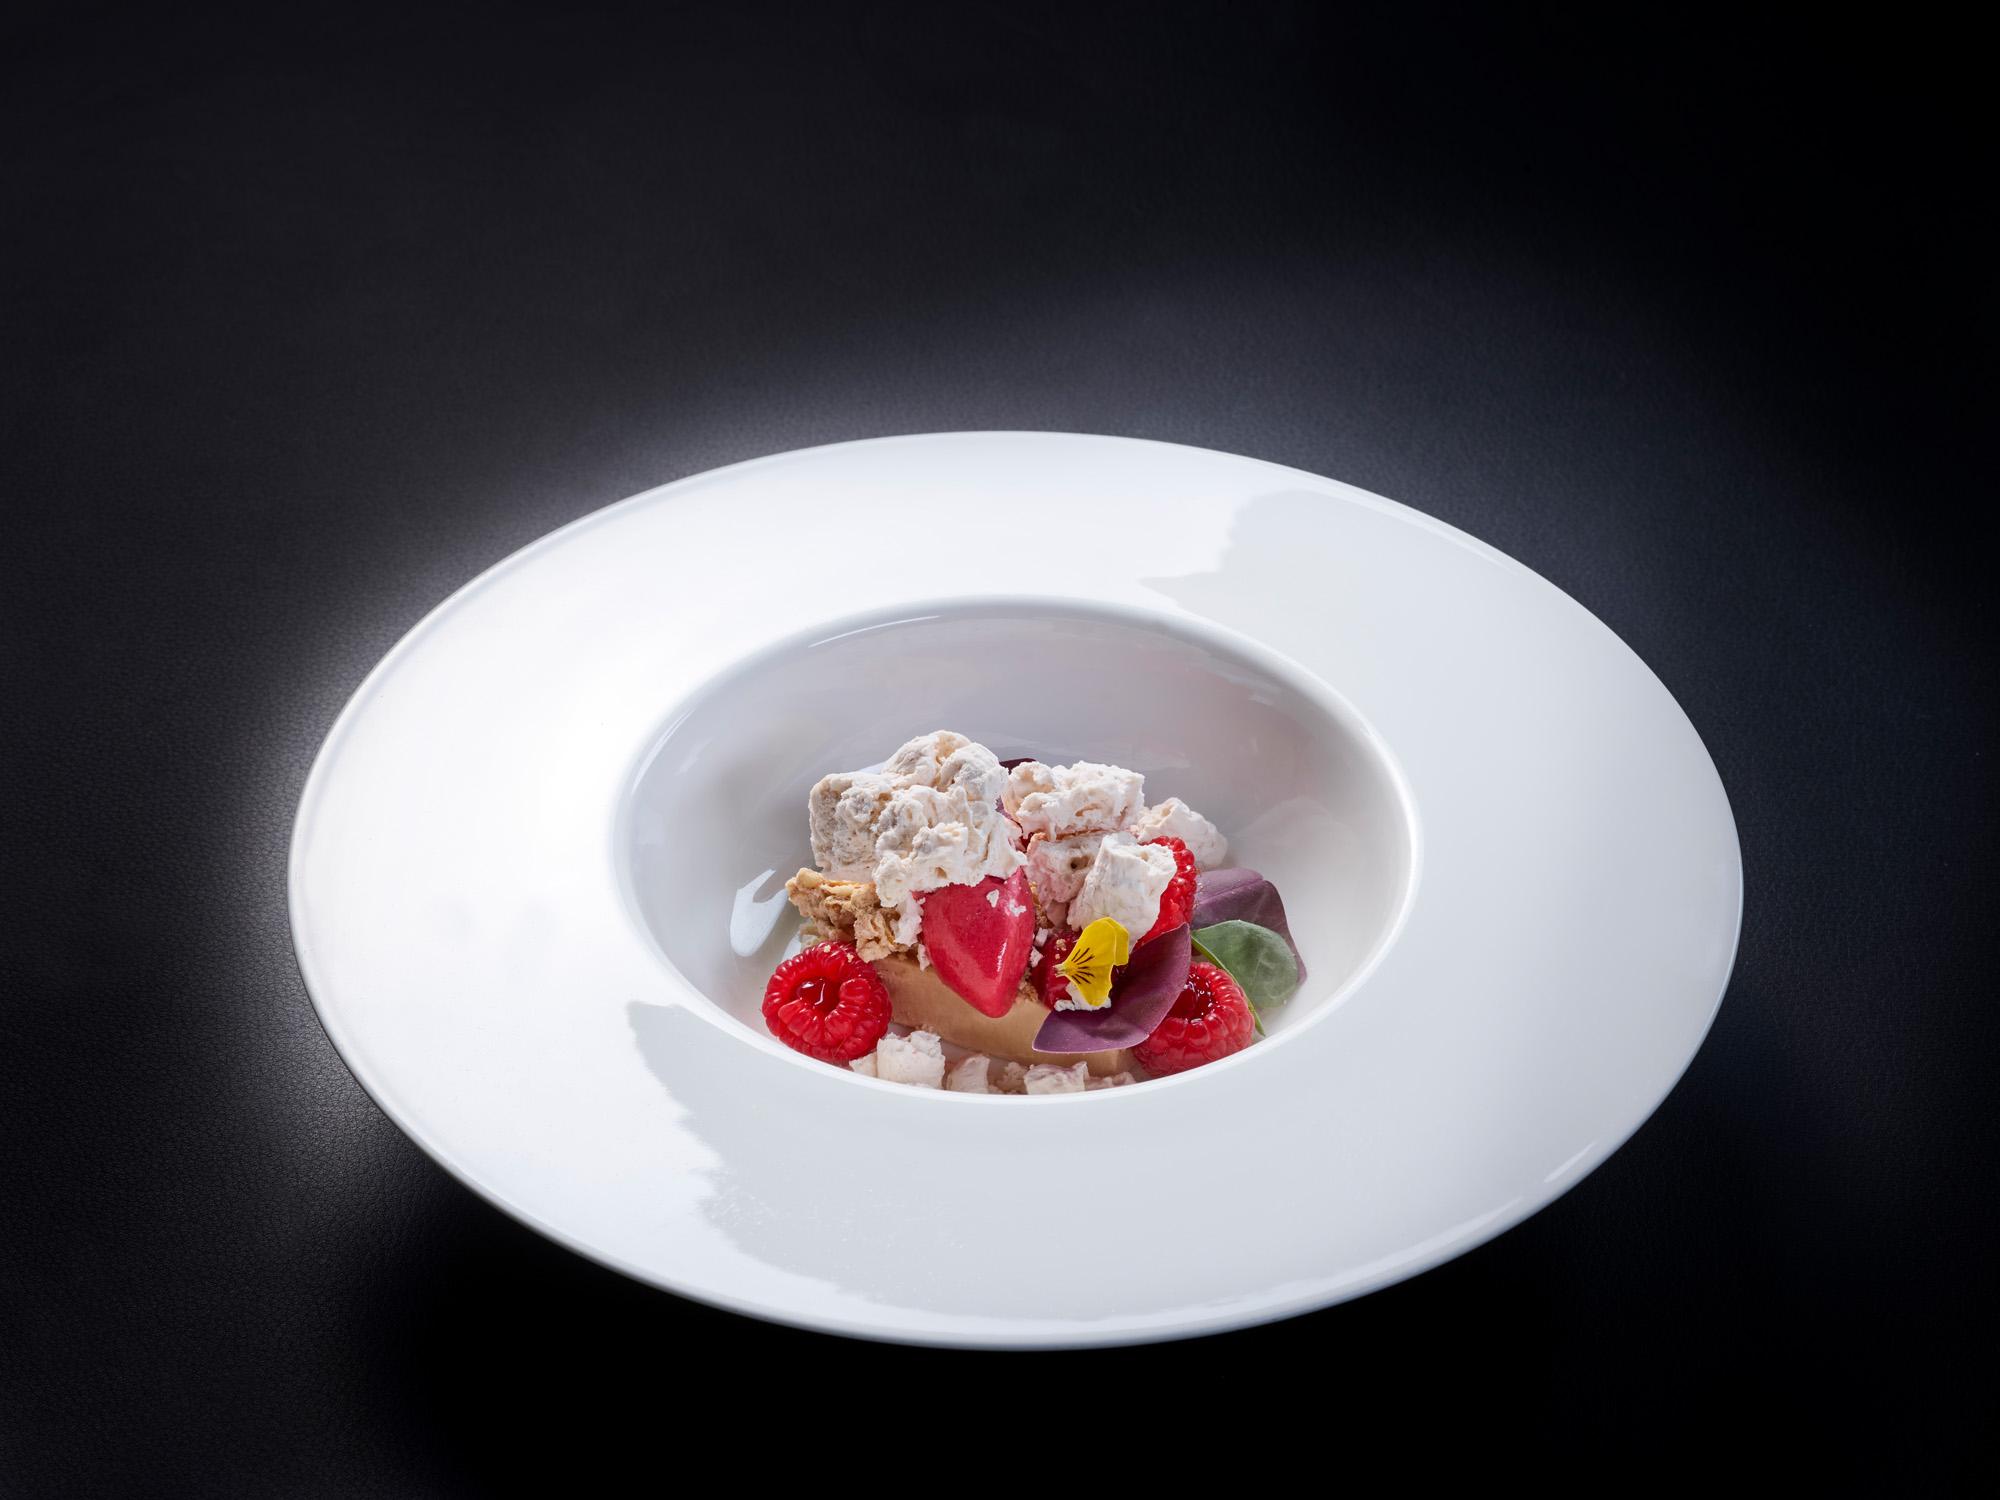 iSi Speisemeisterei 21 9 176266 - iSi Kulinarik: Inspiring Food